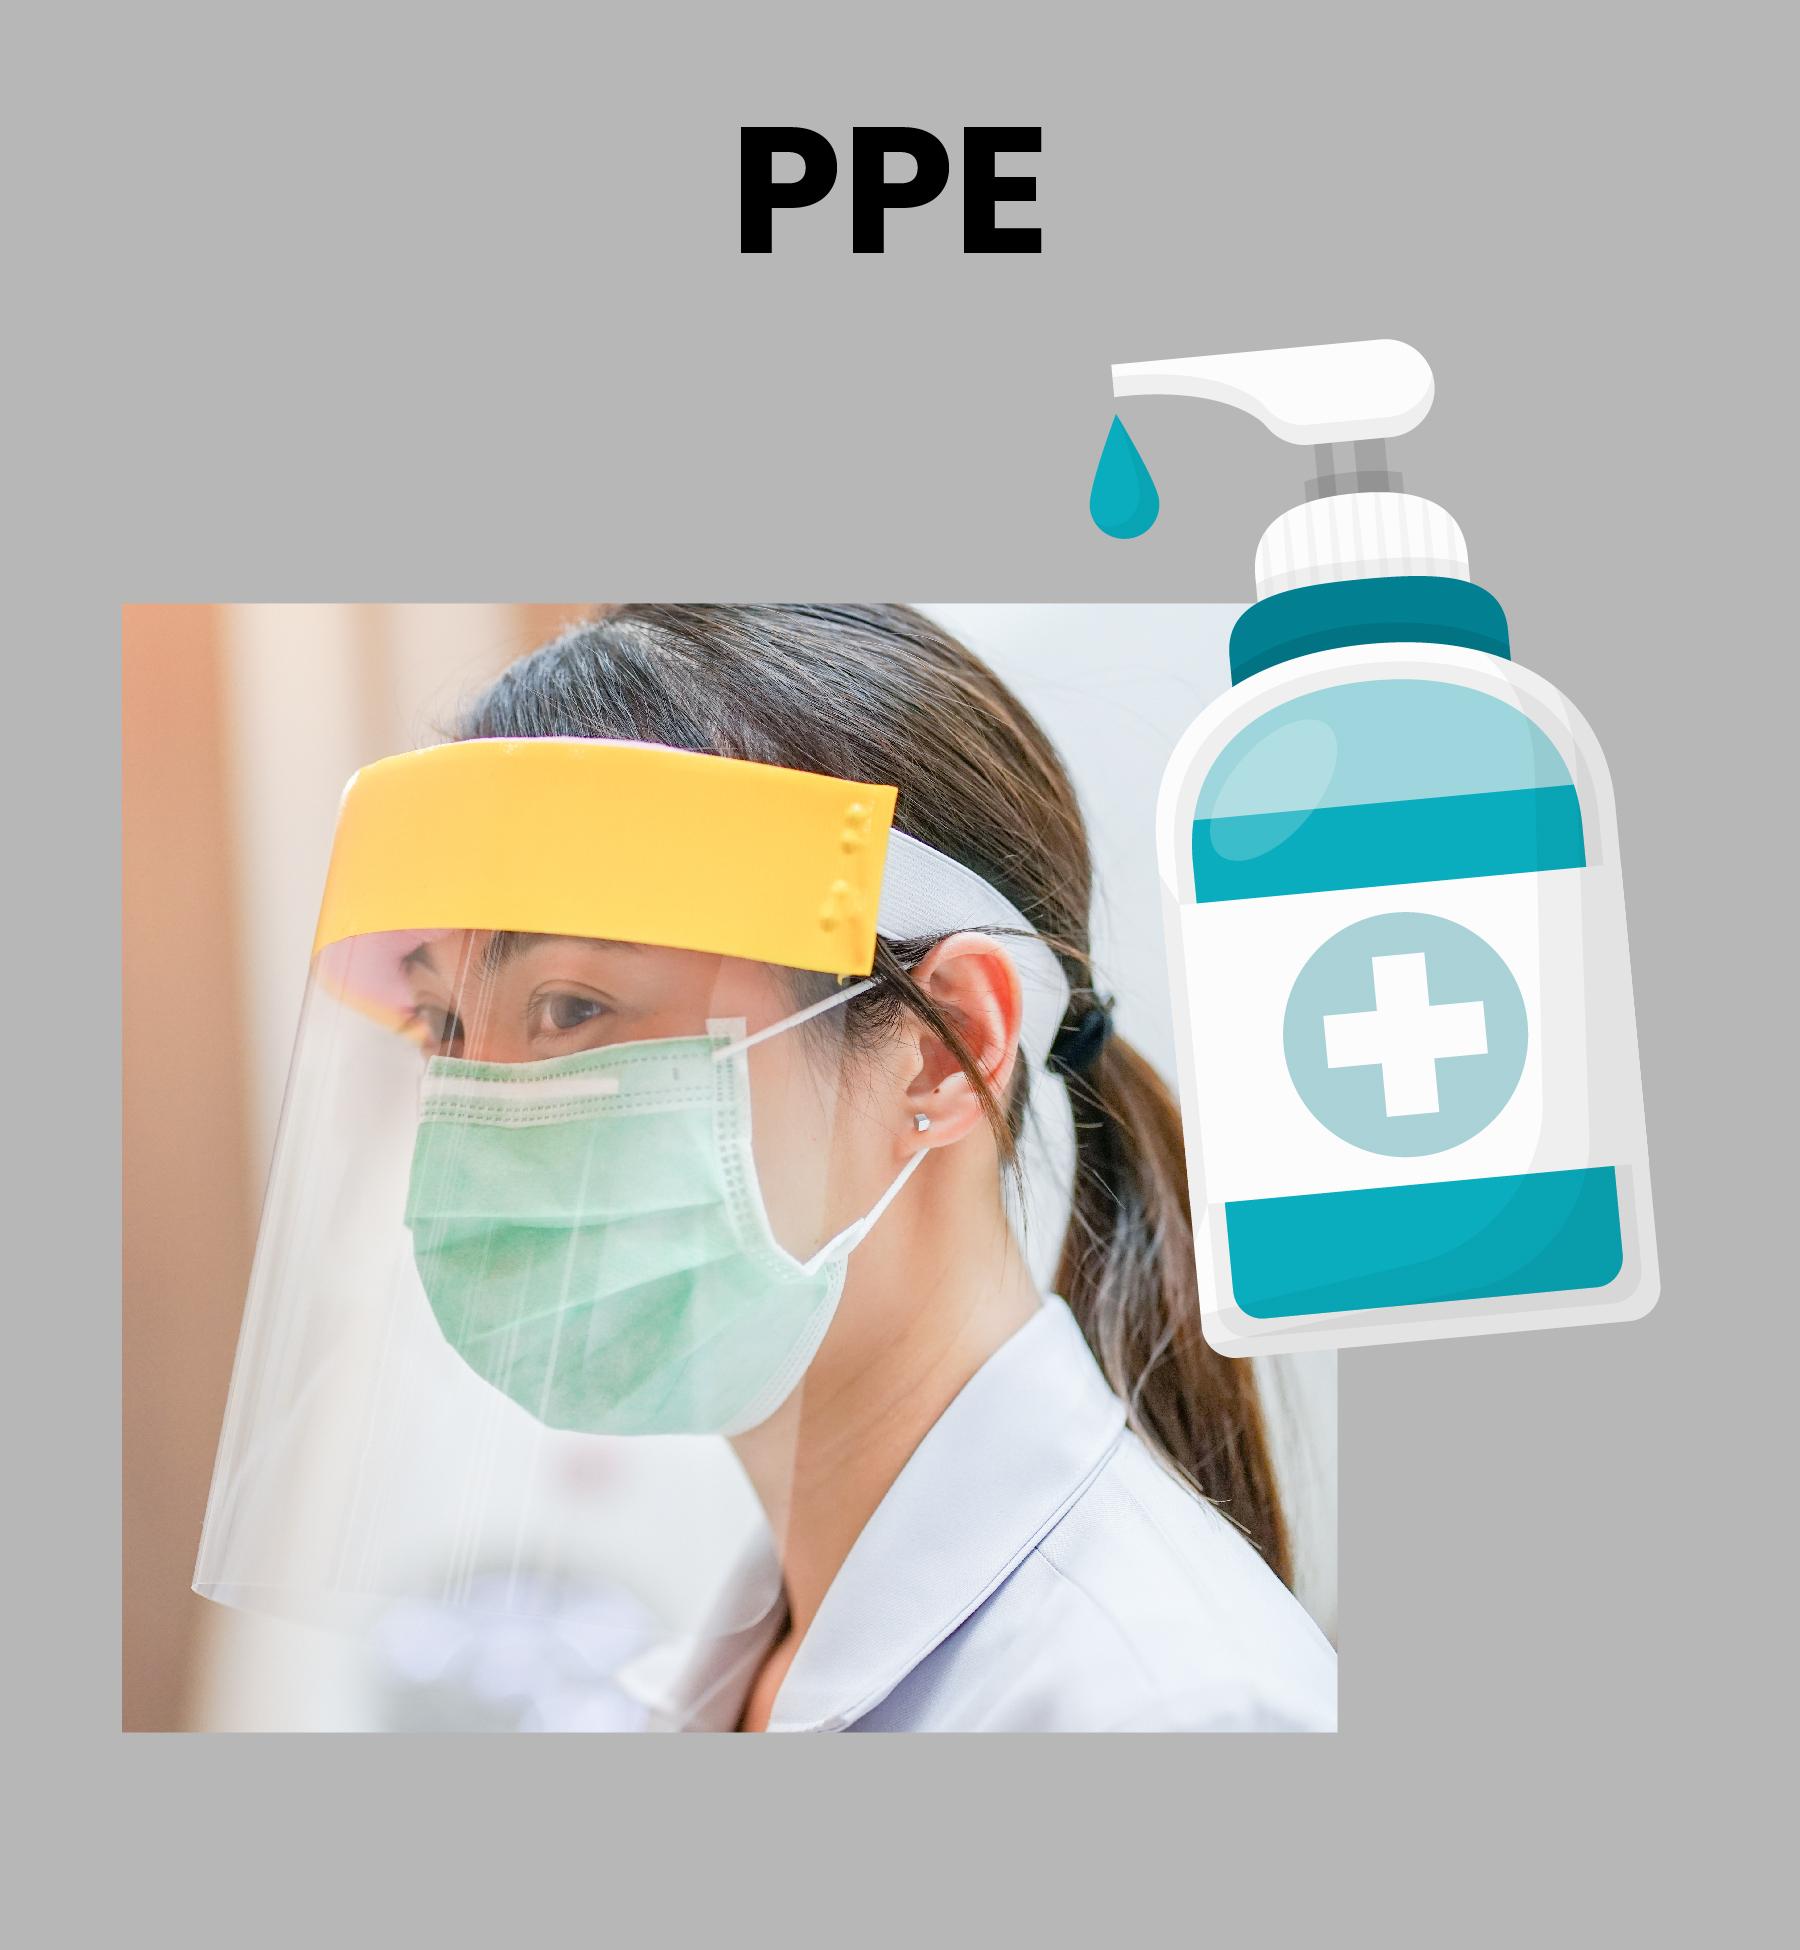 69cff8725a442b8c80f016c06bd97041_PPE-01.jpg